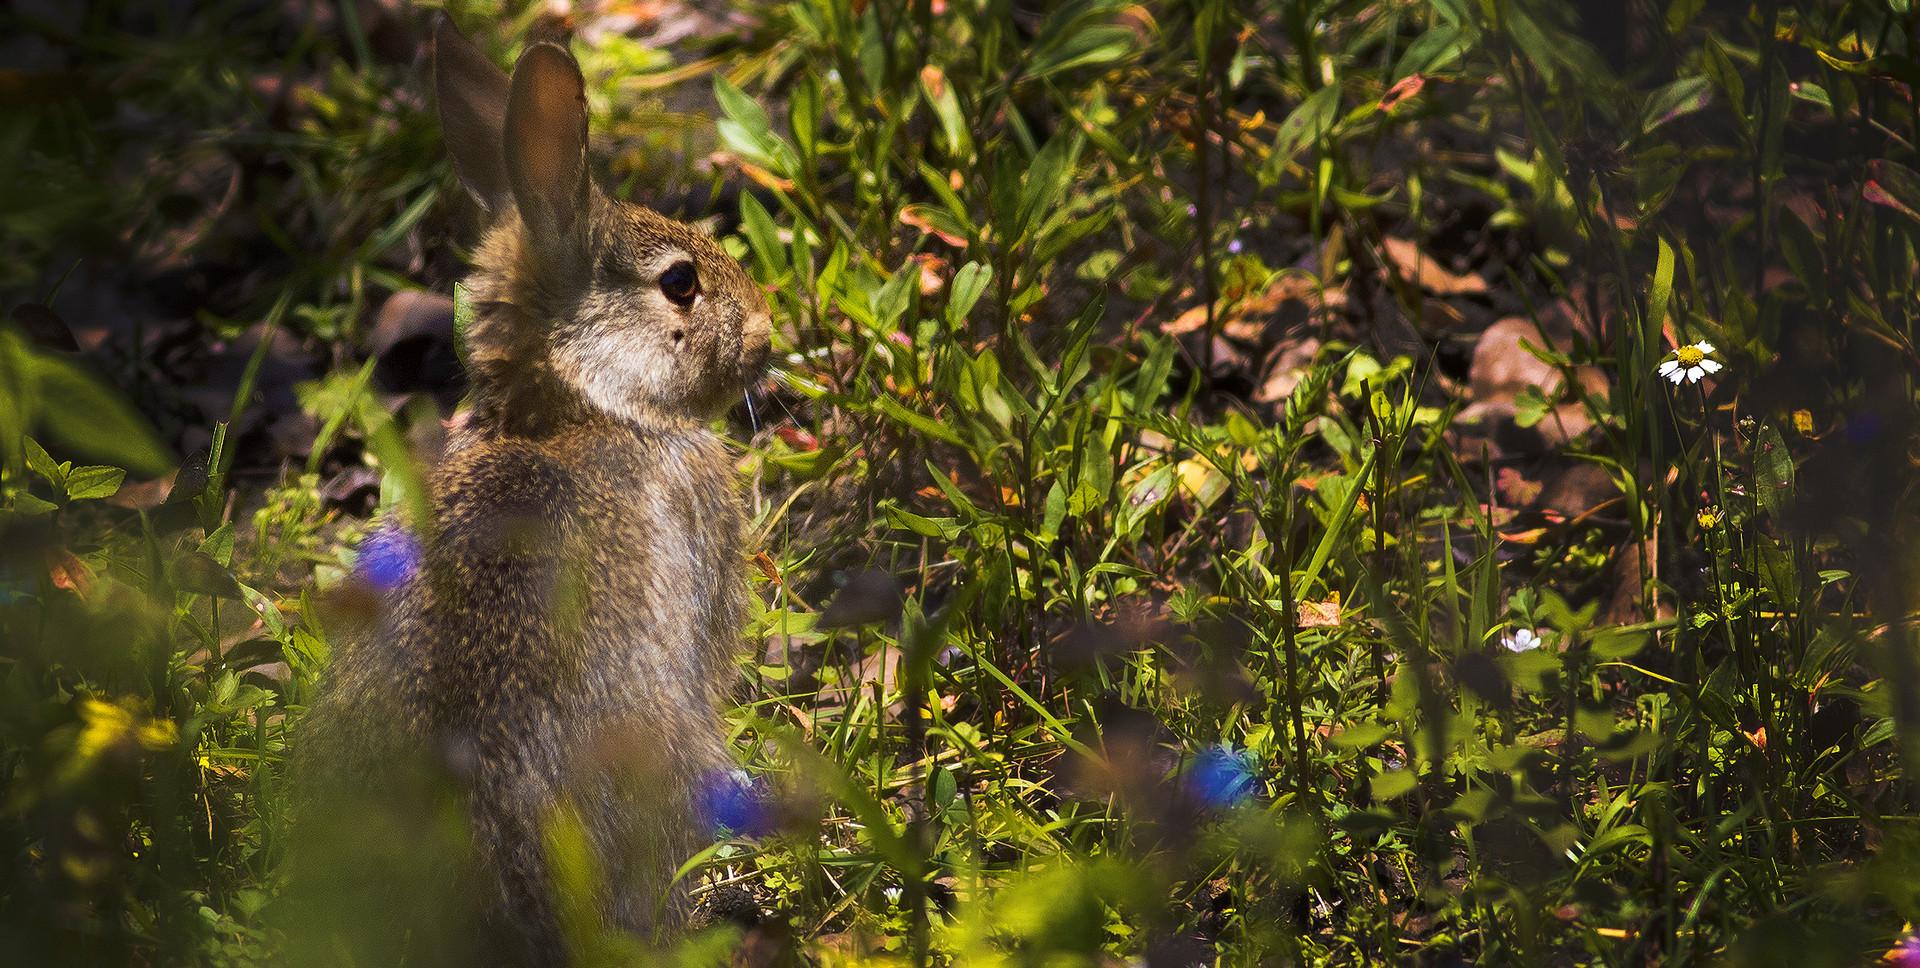 Conejo castellano (Sylvilagus floridanus)